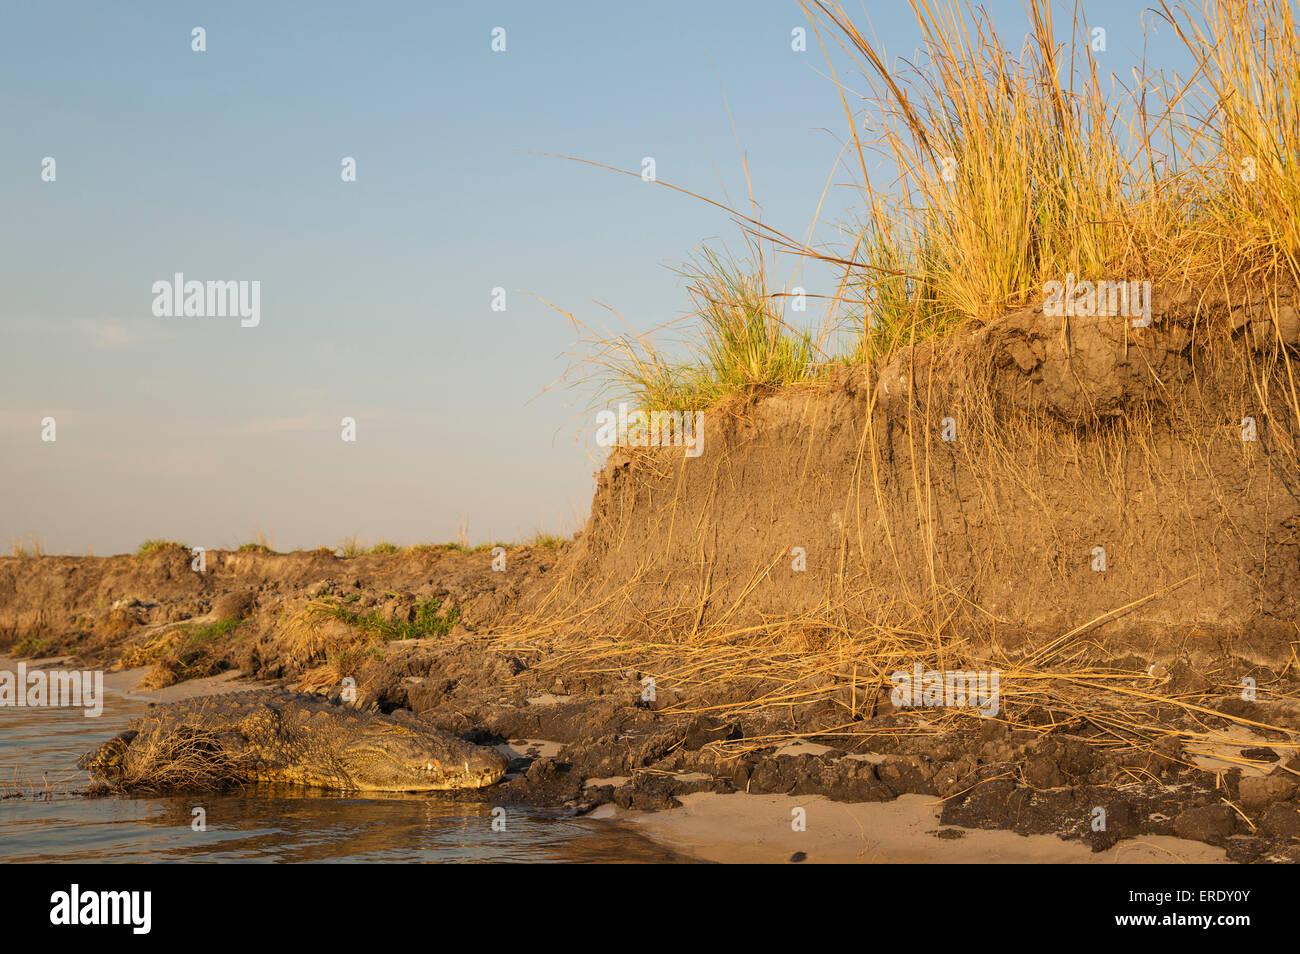 Nile Crocodile (Crocodylus niloticus), basking at the bank of the Chobe River, Chobe National Park, Botswana - Stock Image